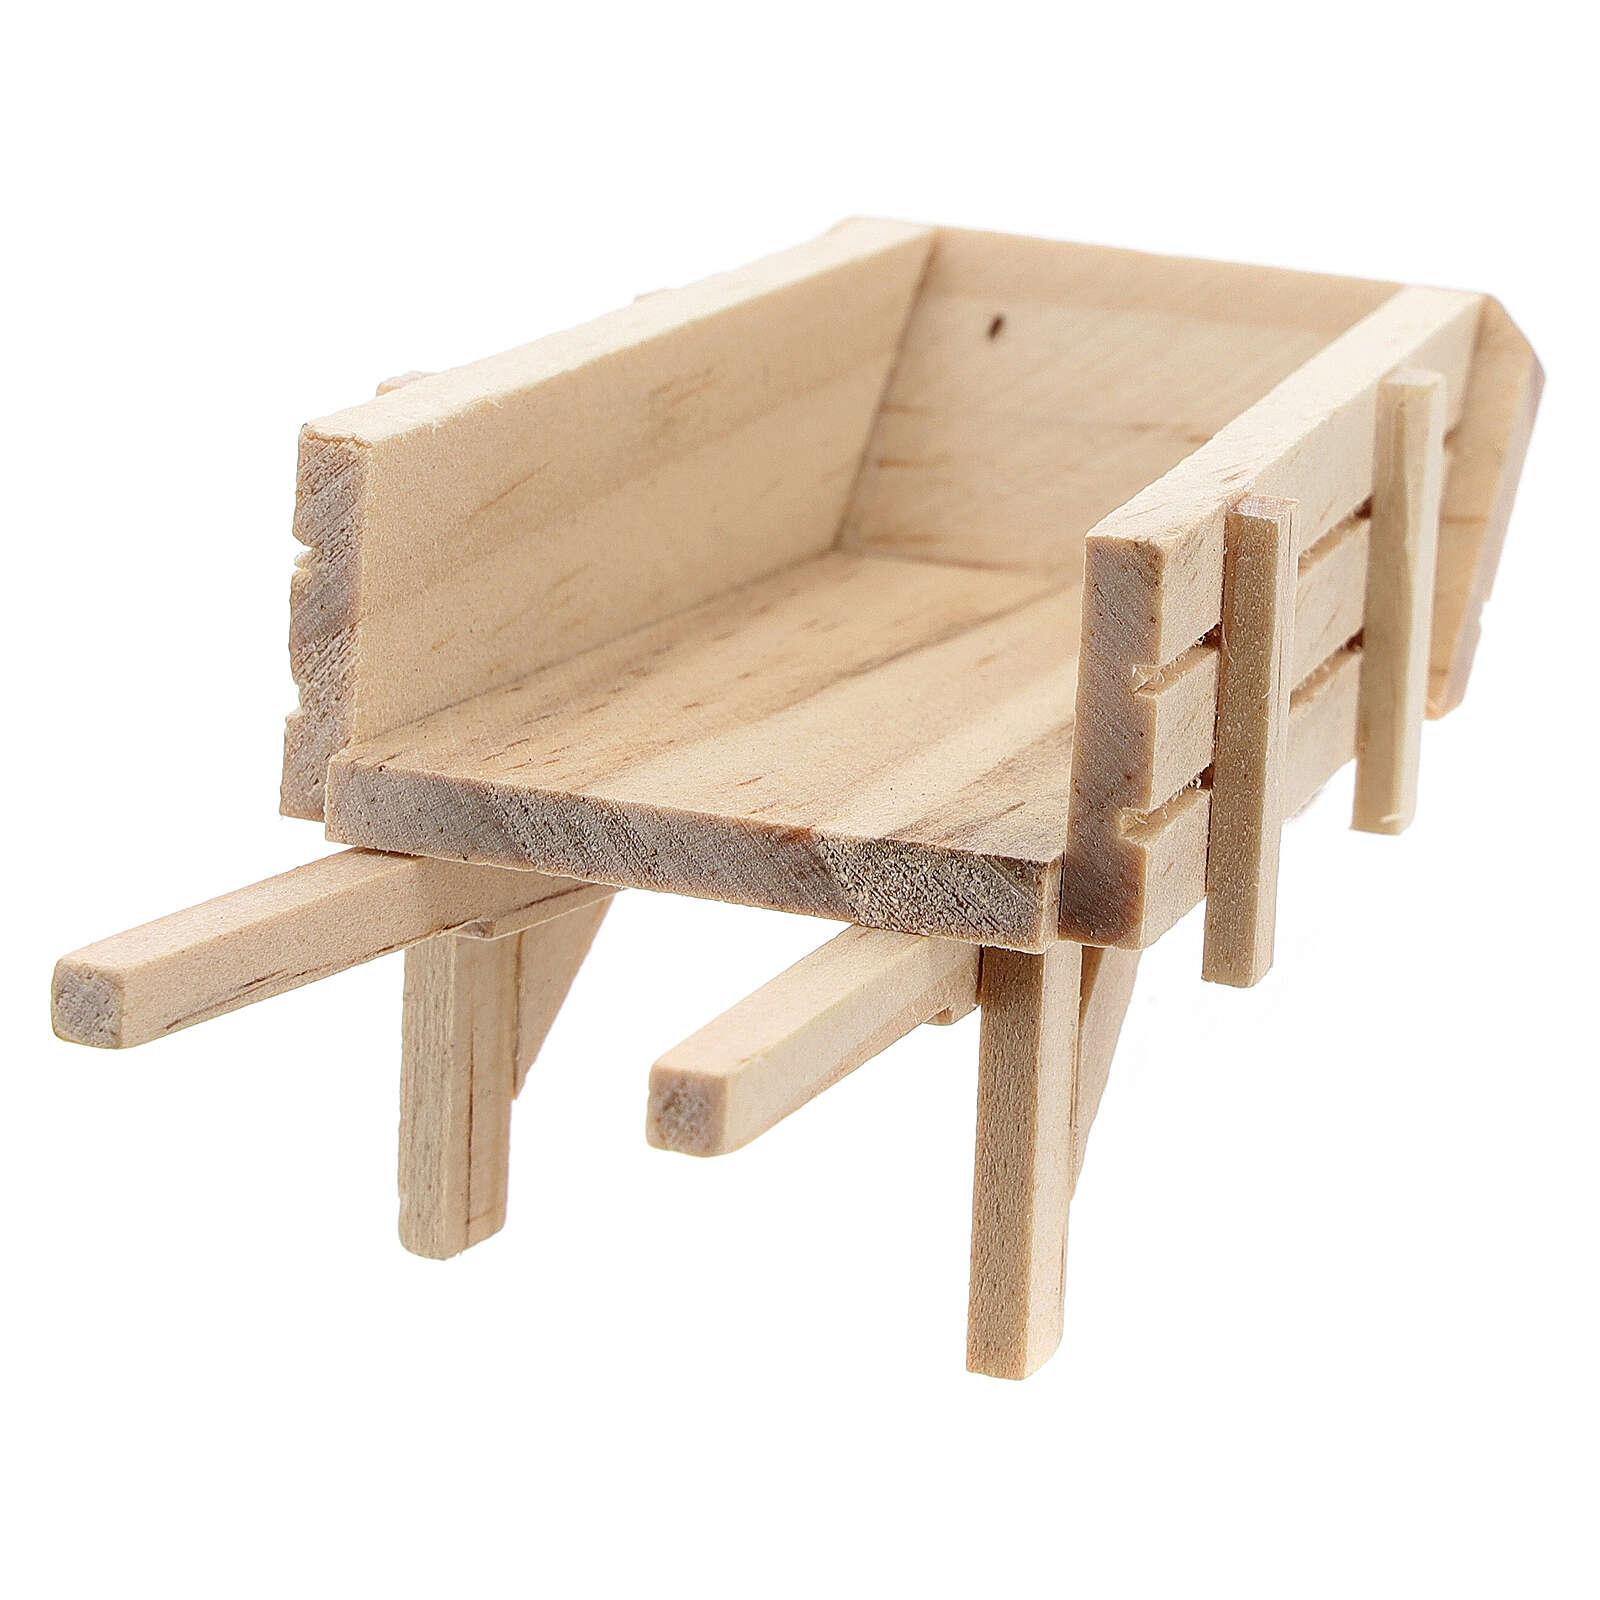 Pale wood wheelbarrow for Nativity Scene with 10 cm figurines 4